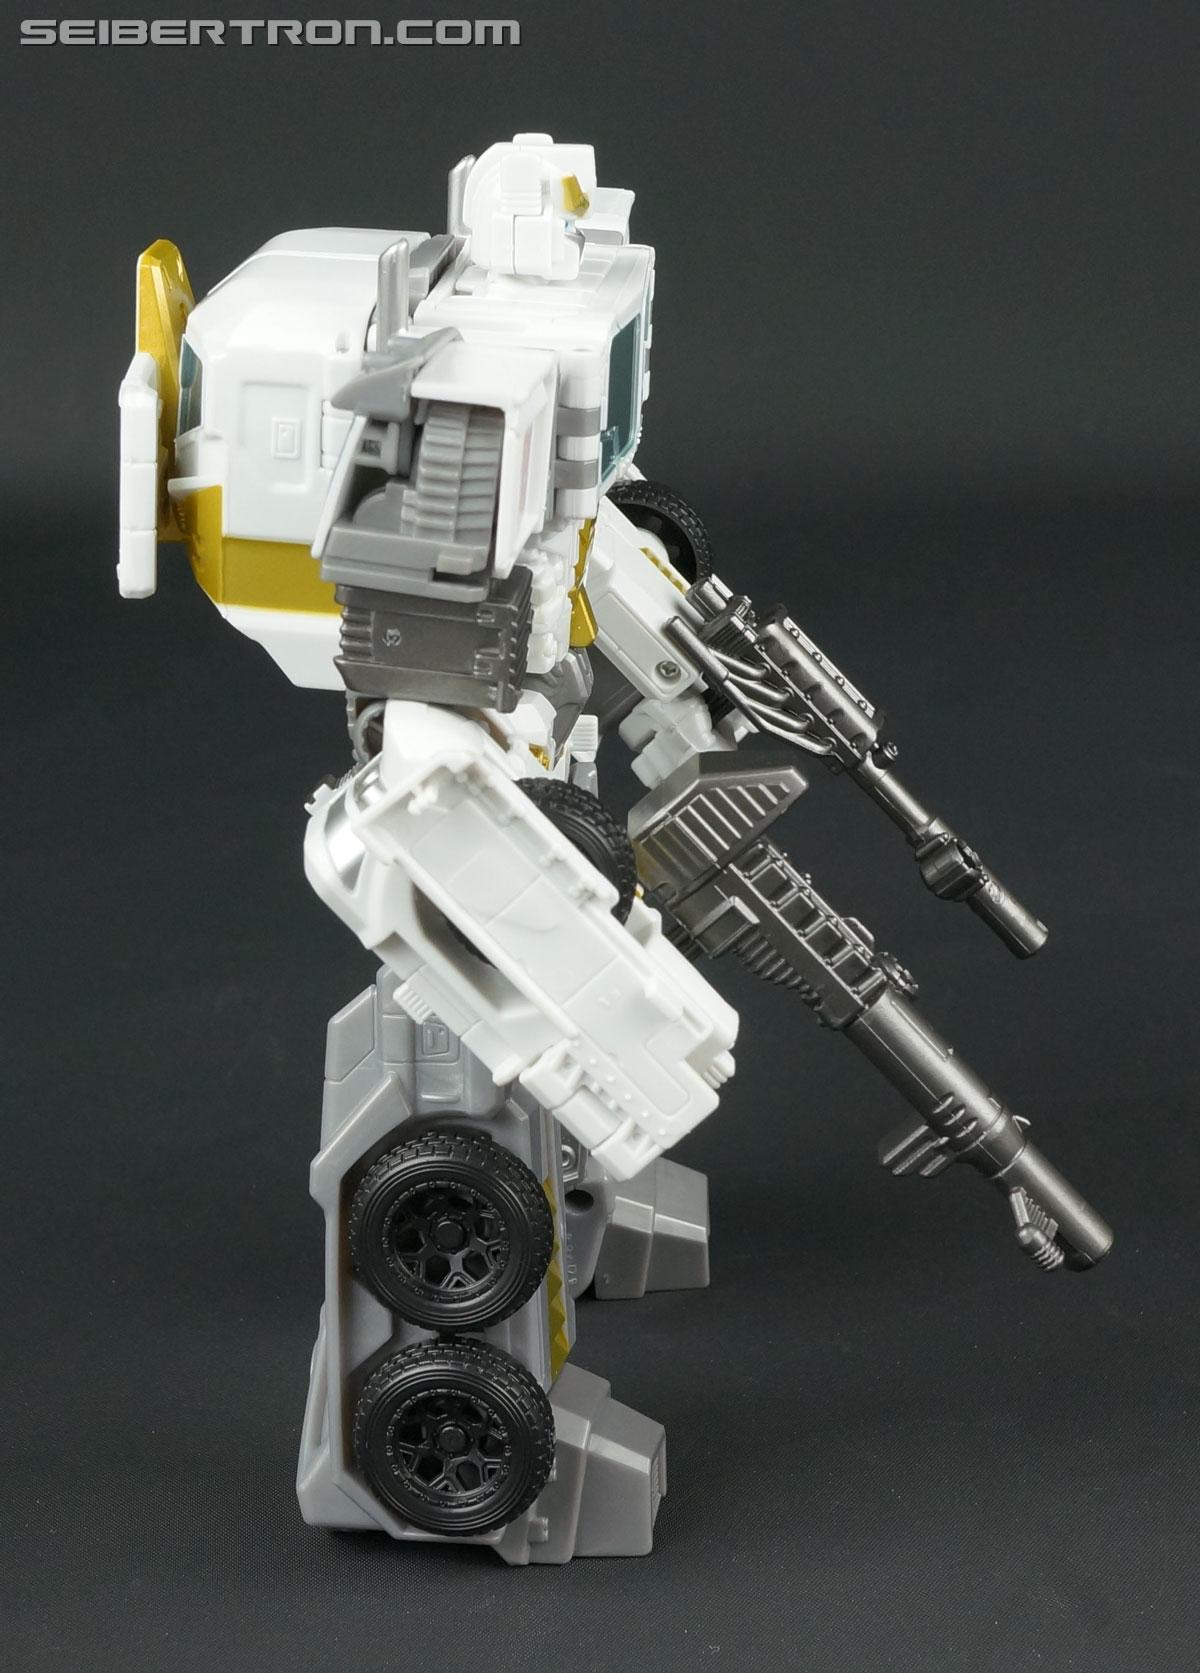 Transformers Generations Combiner Wars Battle Core Optimus Prime (Image #69 of 121)